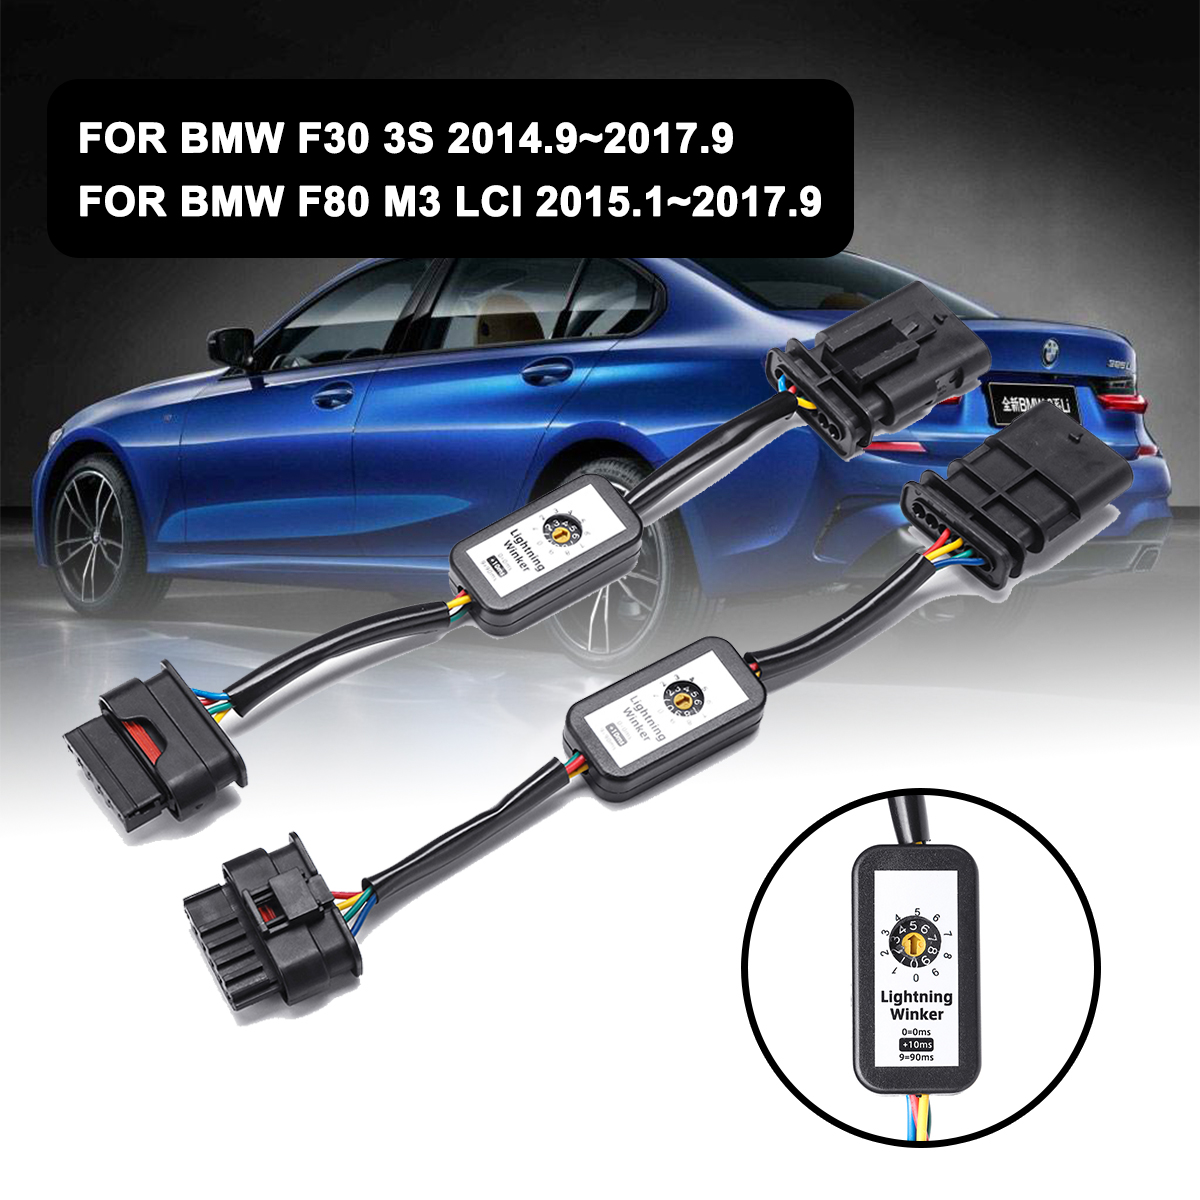 Einheit LED Biegen Sie Signal 63117419615 X Blinker BMW F30 F31 F35 LCI Facelift